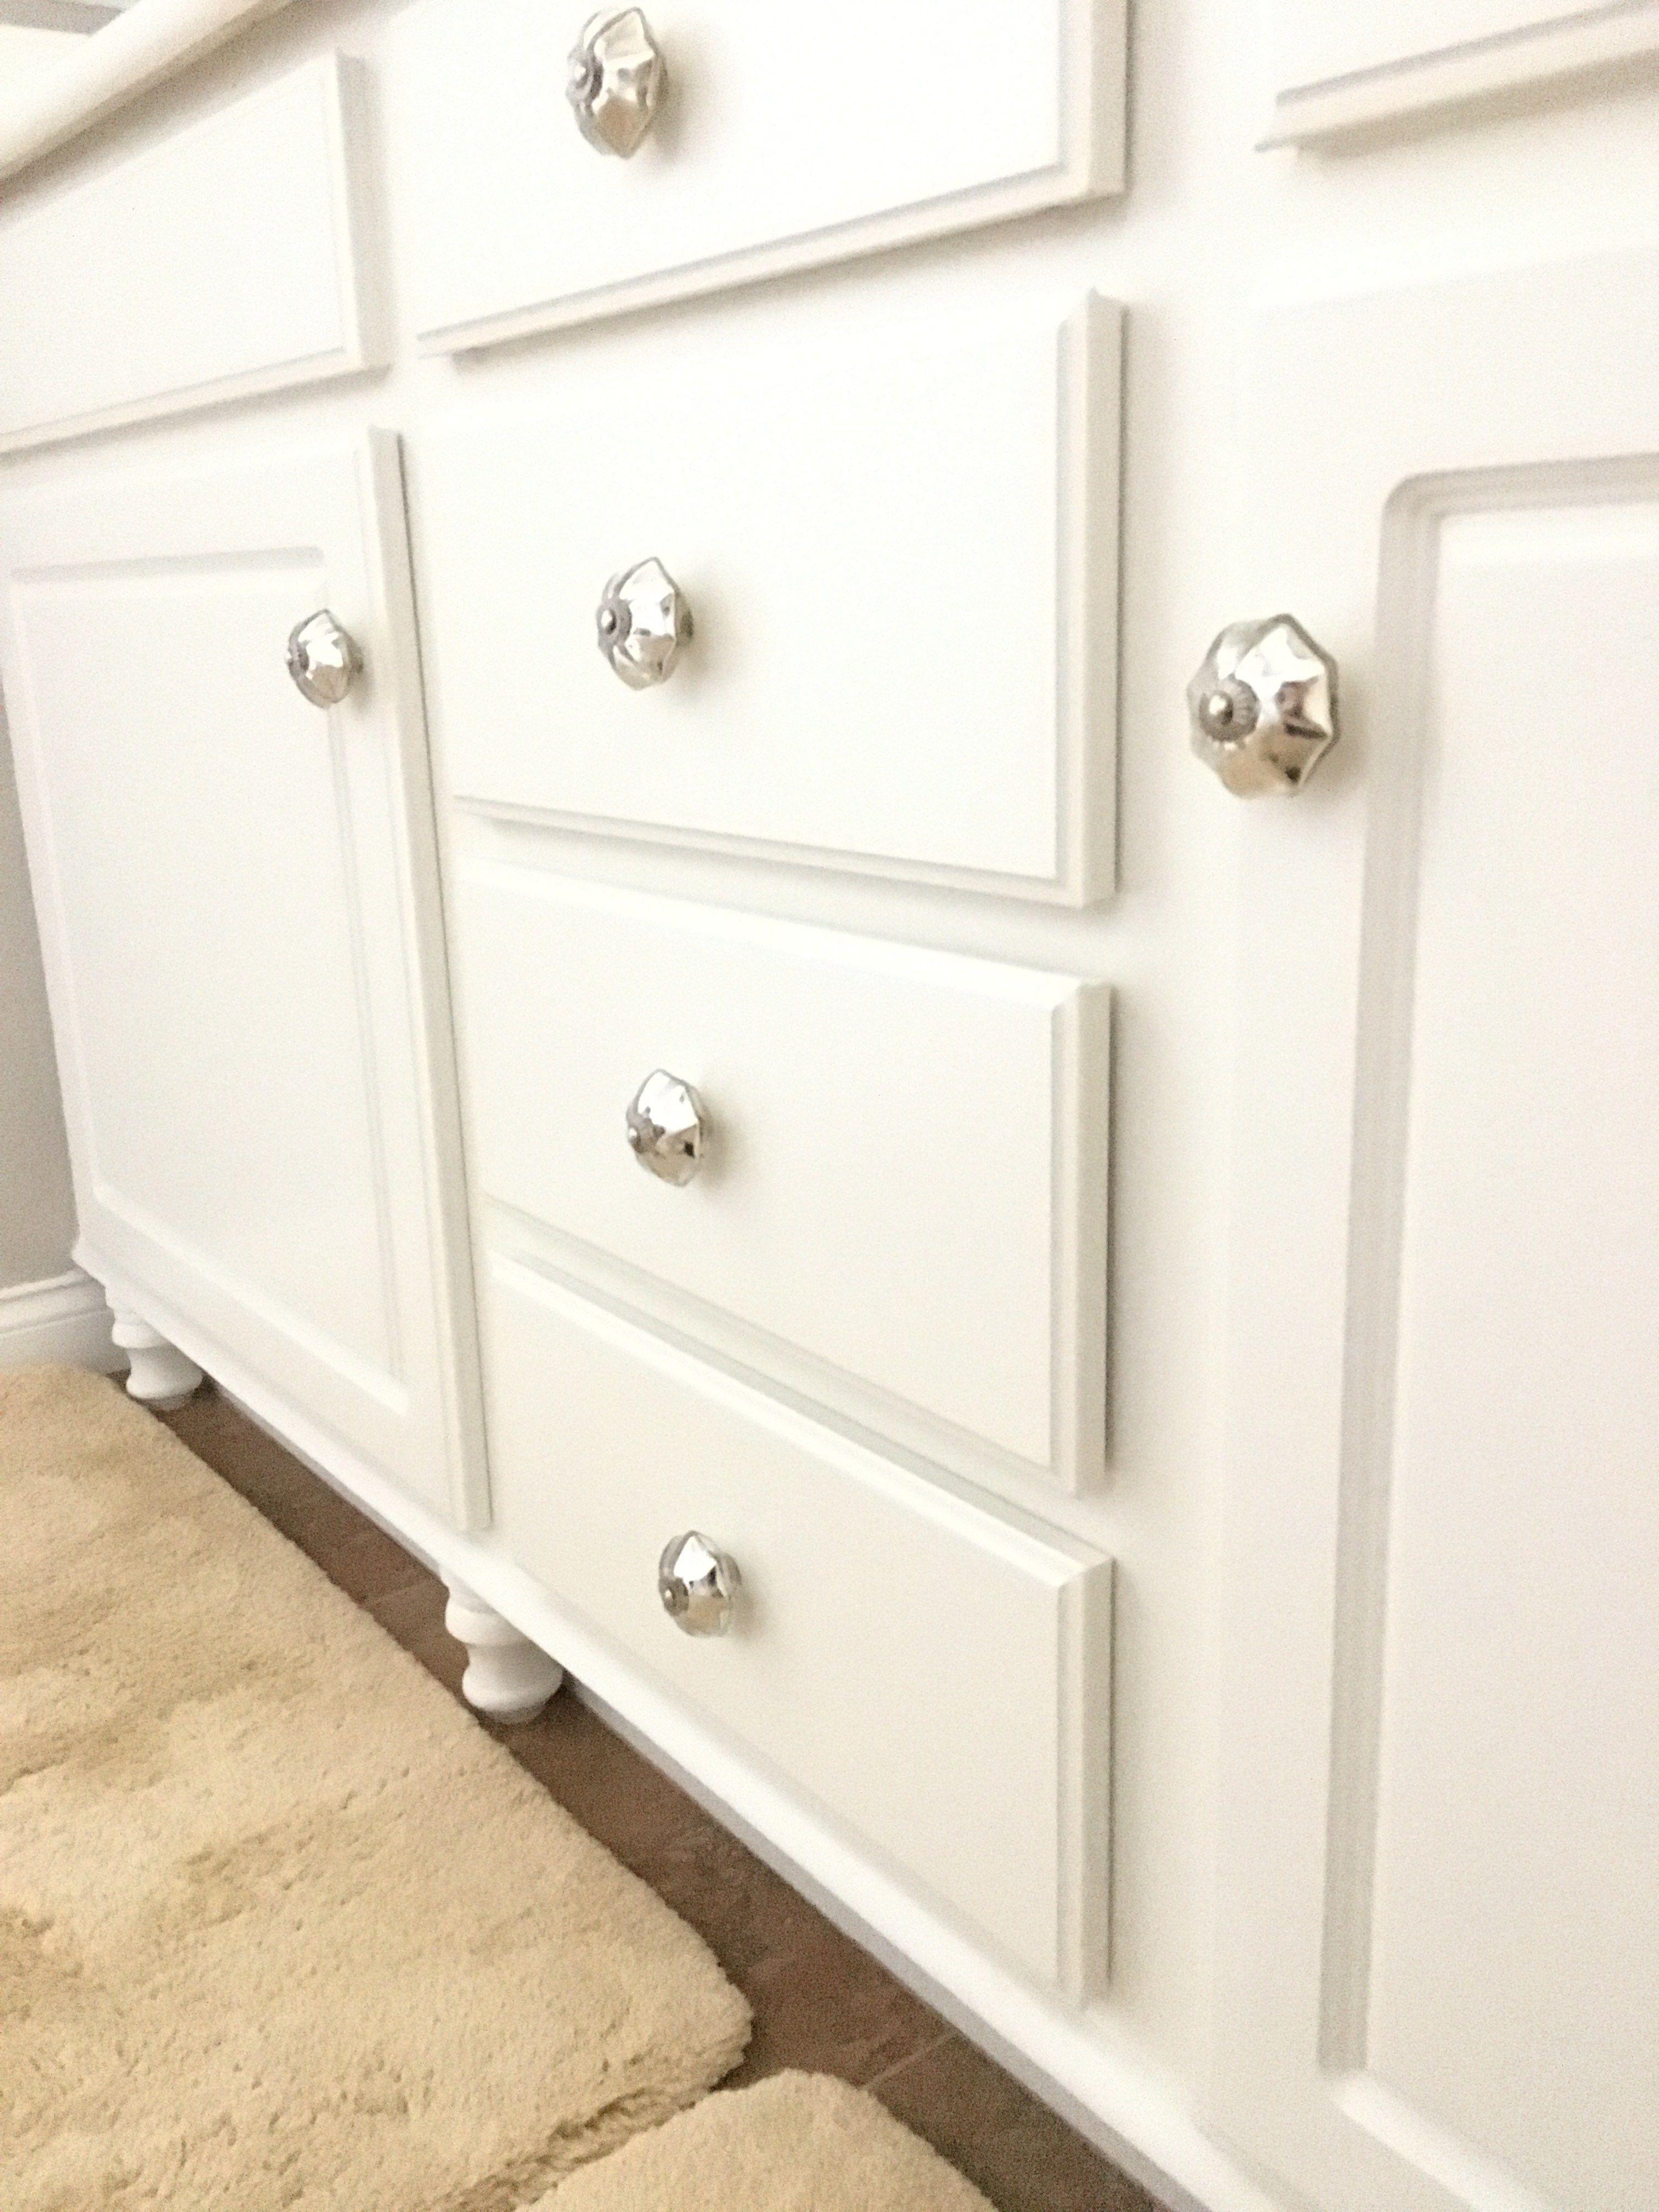 Repairing Mdf Cabinets Honey N Hydrangea Mdf Cabinet Doors Mdf Cabinets Kitchen Cabinets Mdf